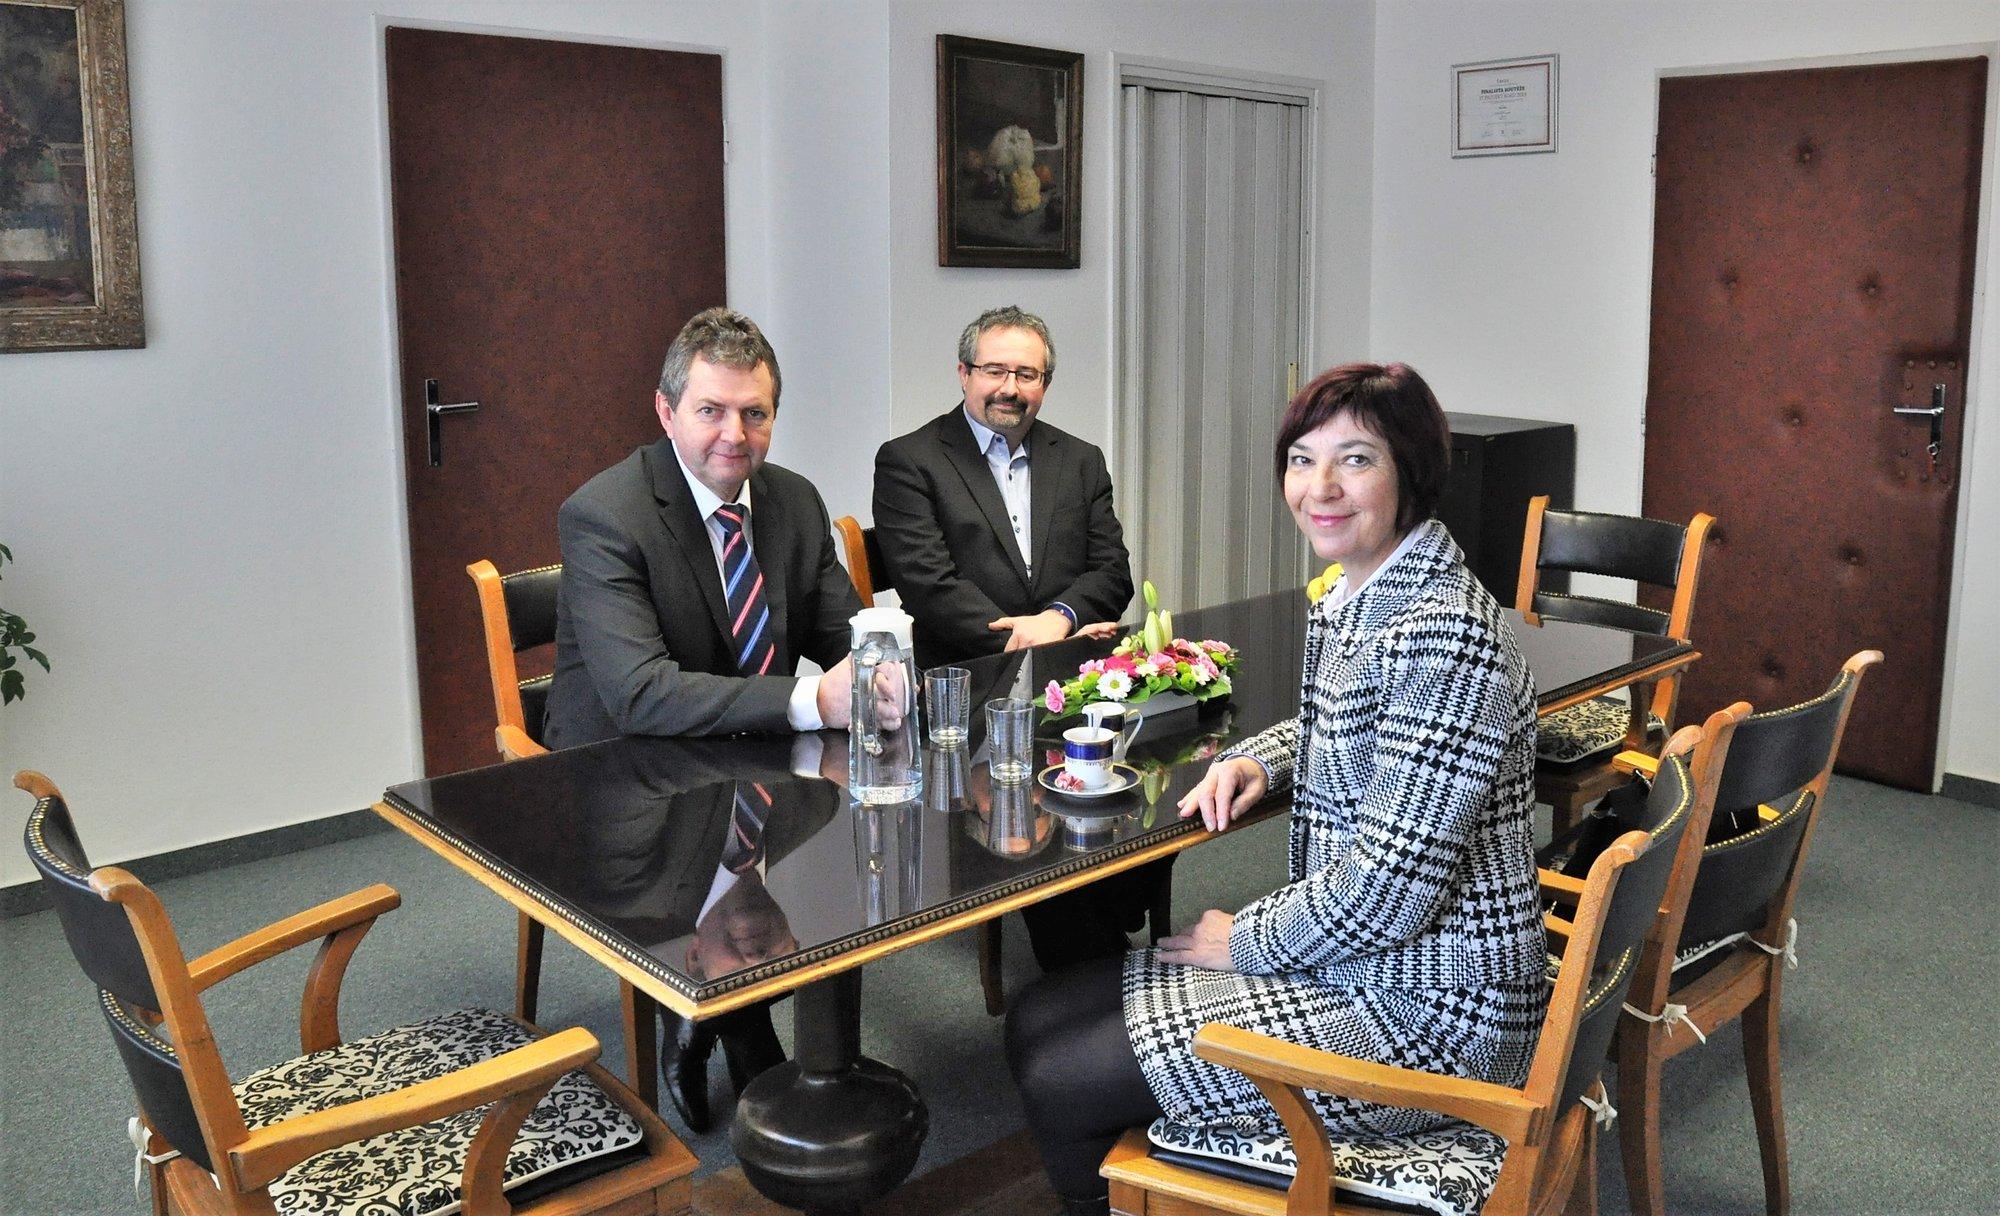 Univerzita Pardubice jako jediná v zemi otevírá obor ve spolupráci s ČOI_autor ČOI